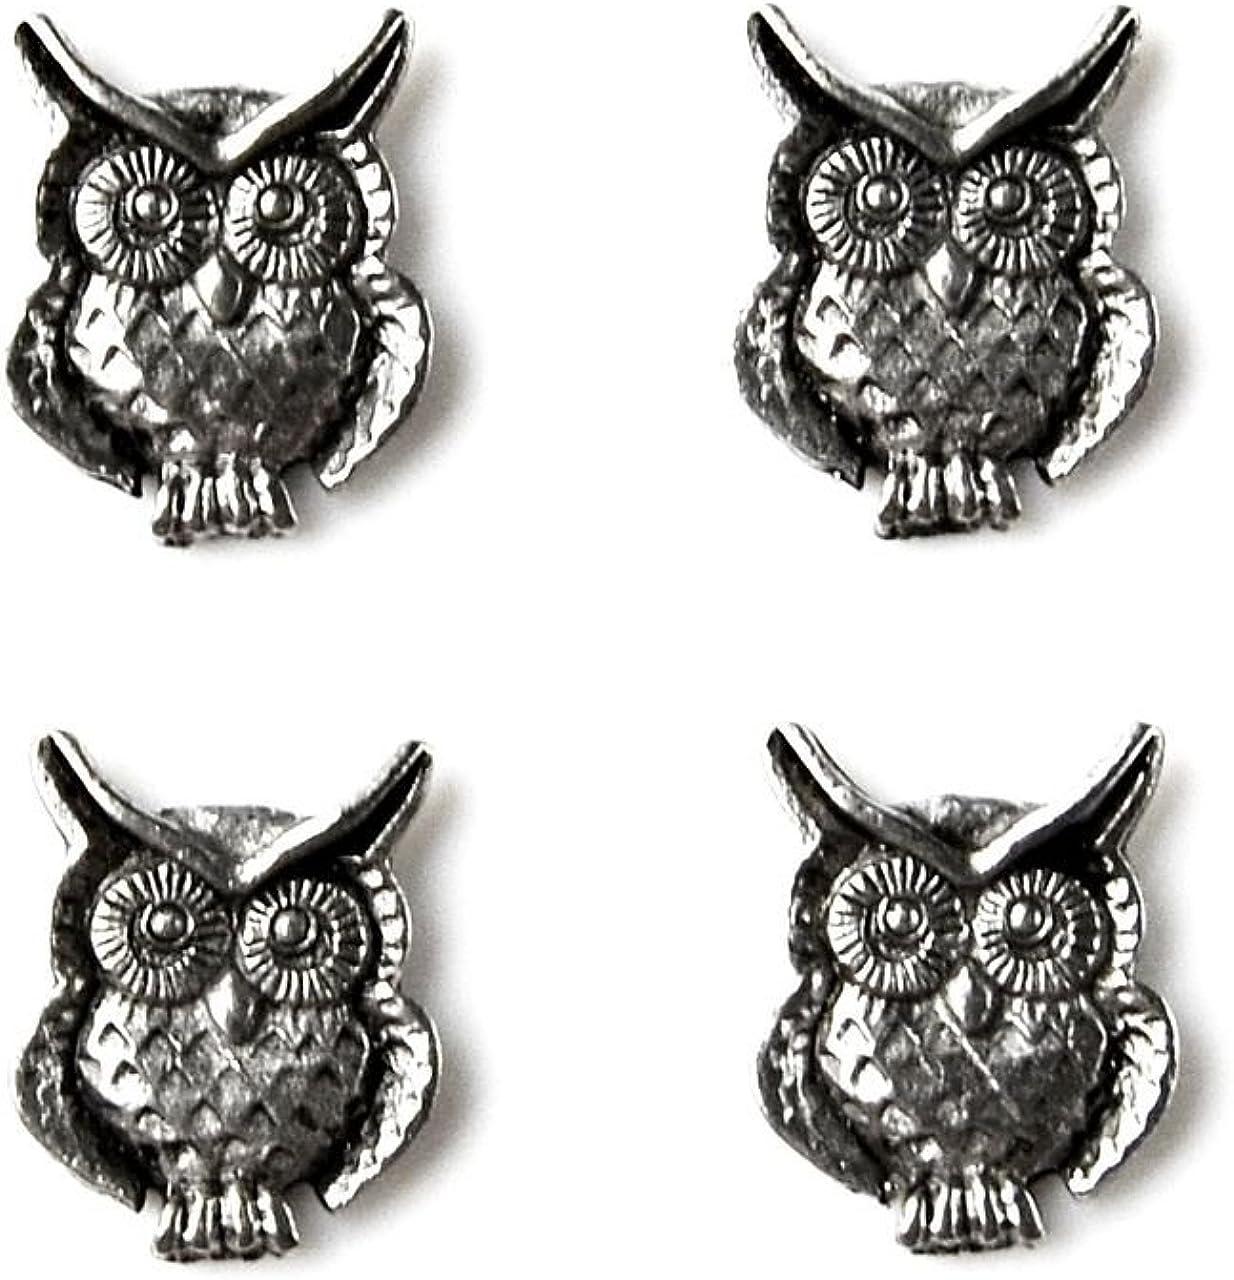 Quality Handcrafts Guaranteed Owl Tuxedo Studs